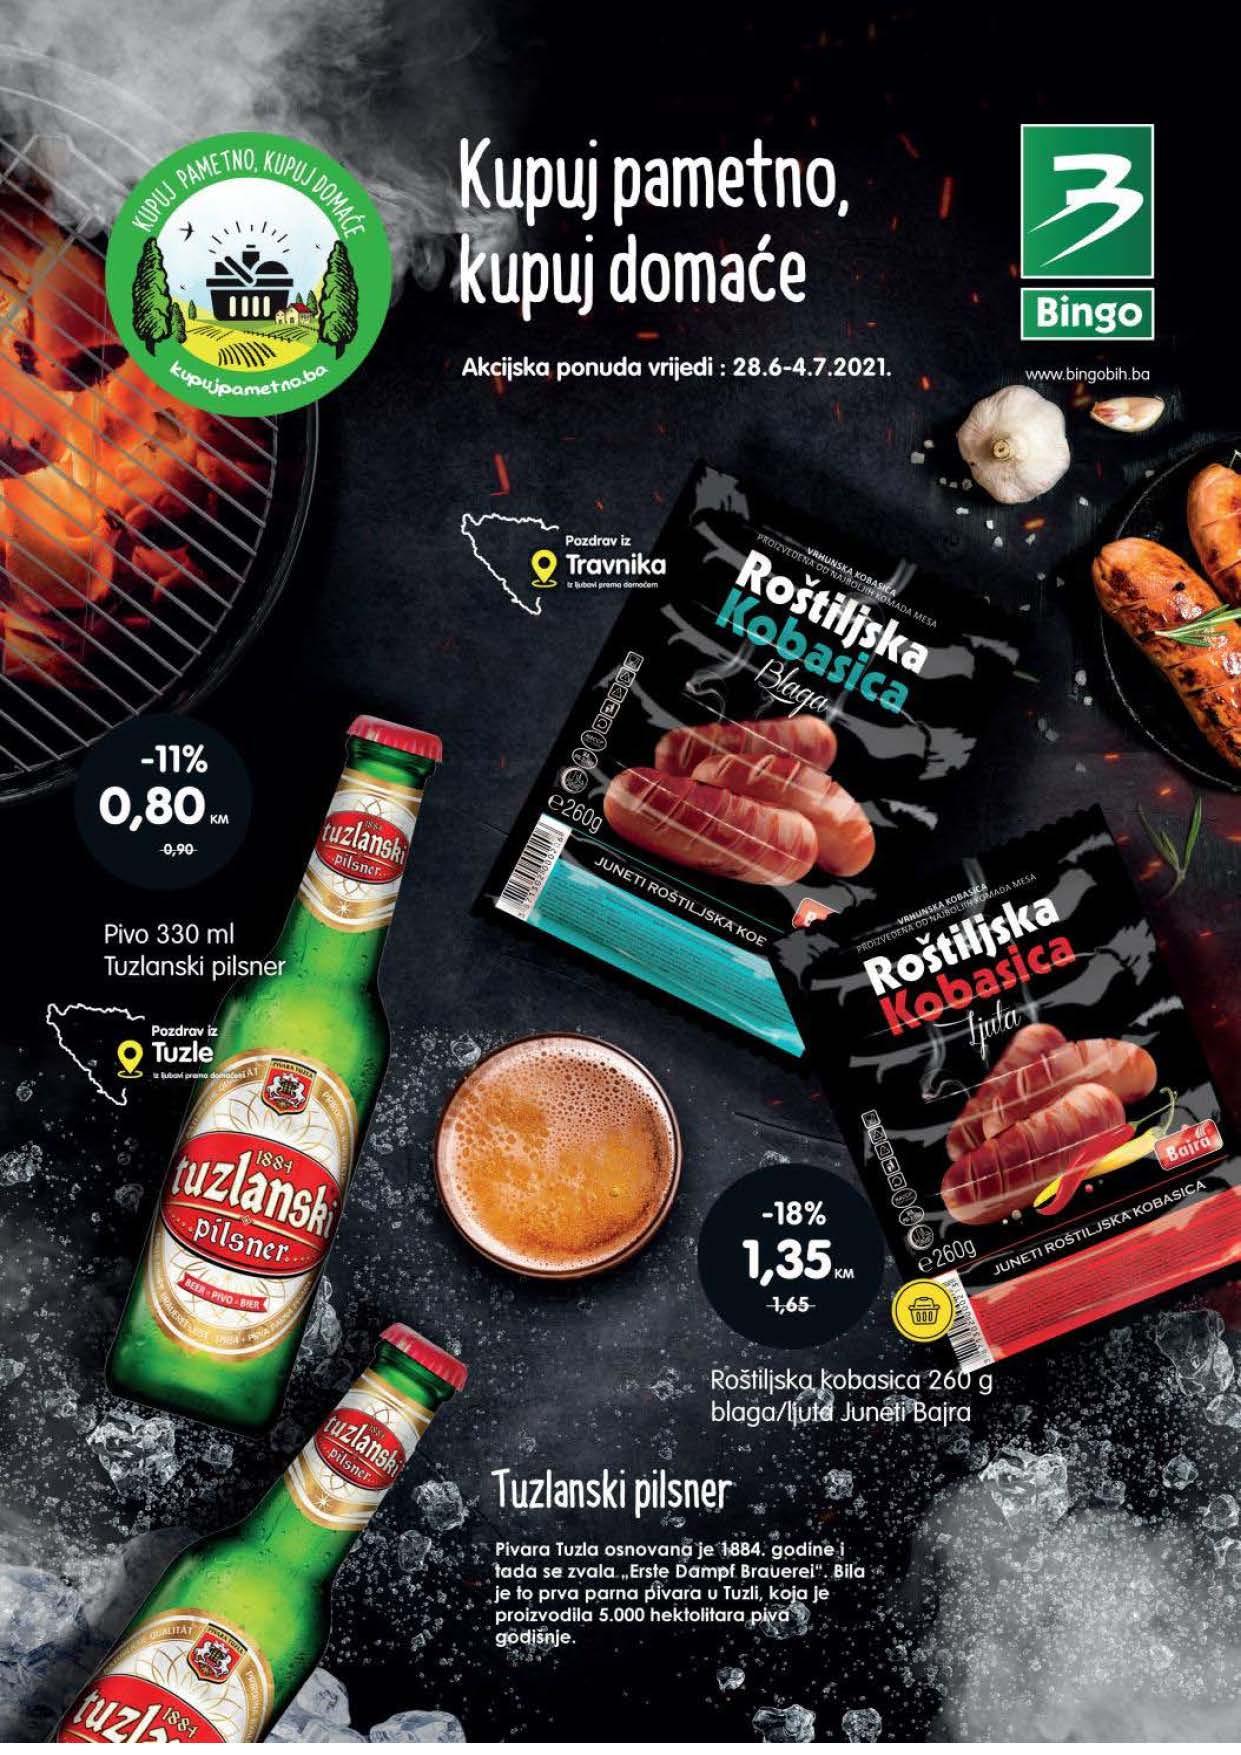 BINGO Katalog Kupuj pametno kupuj domace JUN JUL 2021 28.6.2021. 4.7.2021. Page 1 1